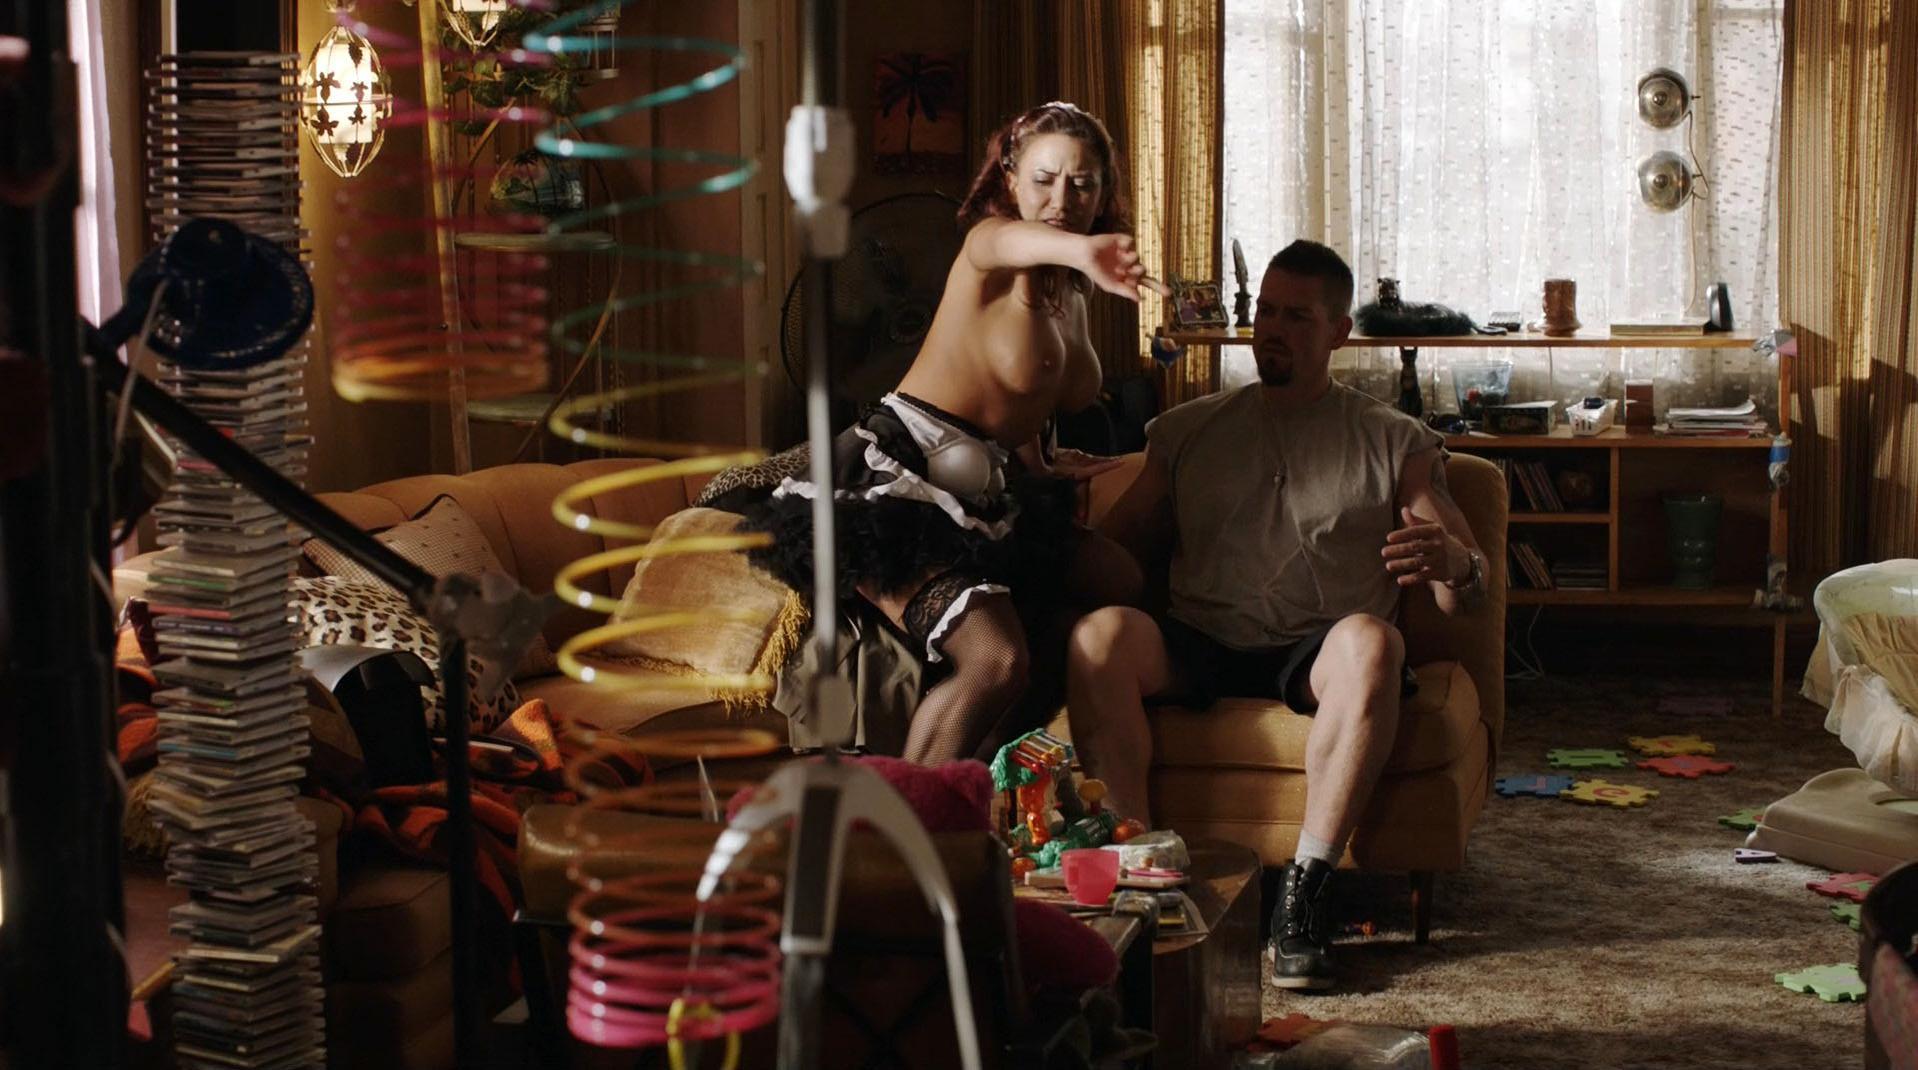 Alyssa LeBlanc nude - Shameless s07e02 (2016)